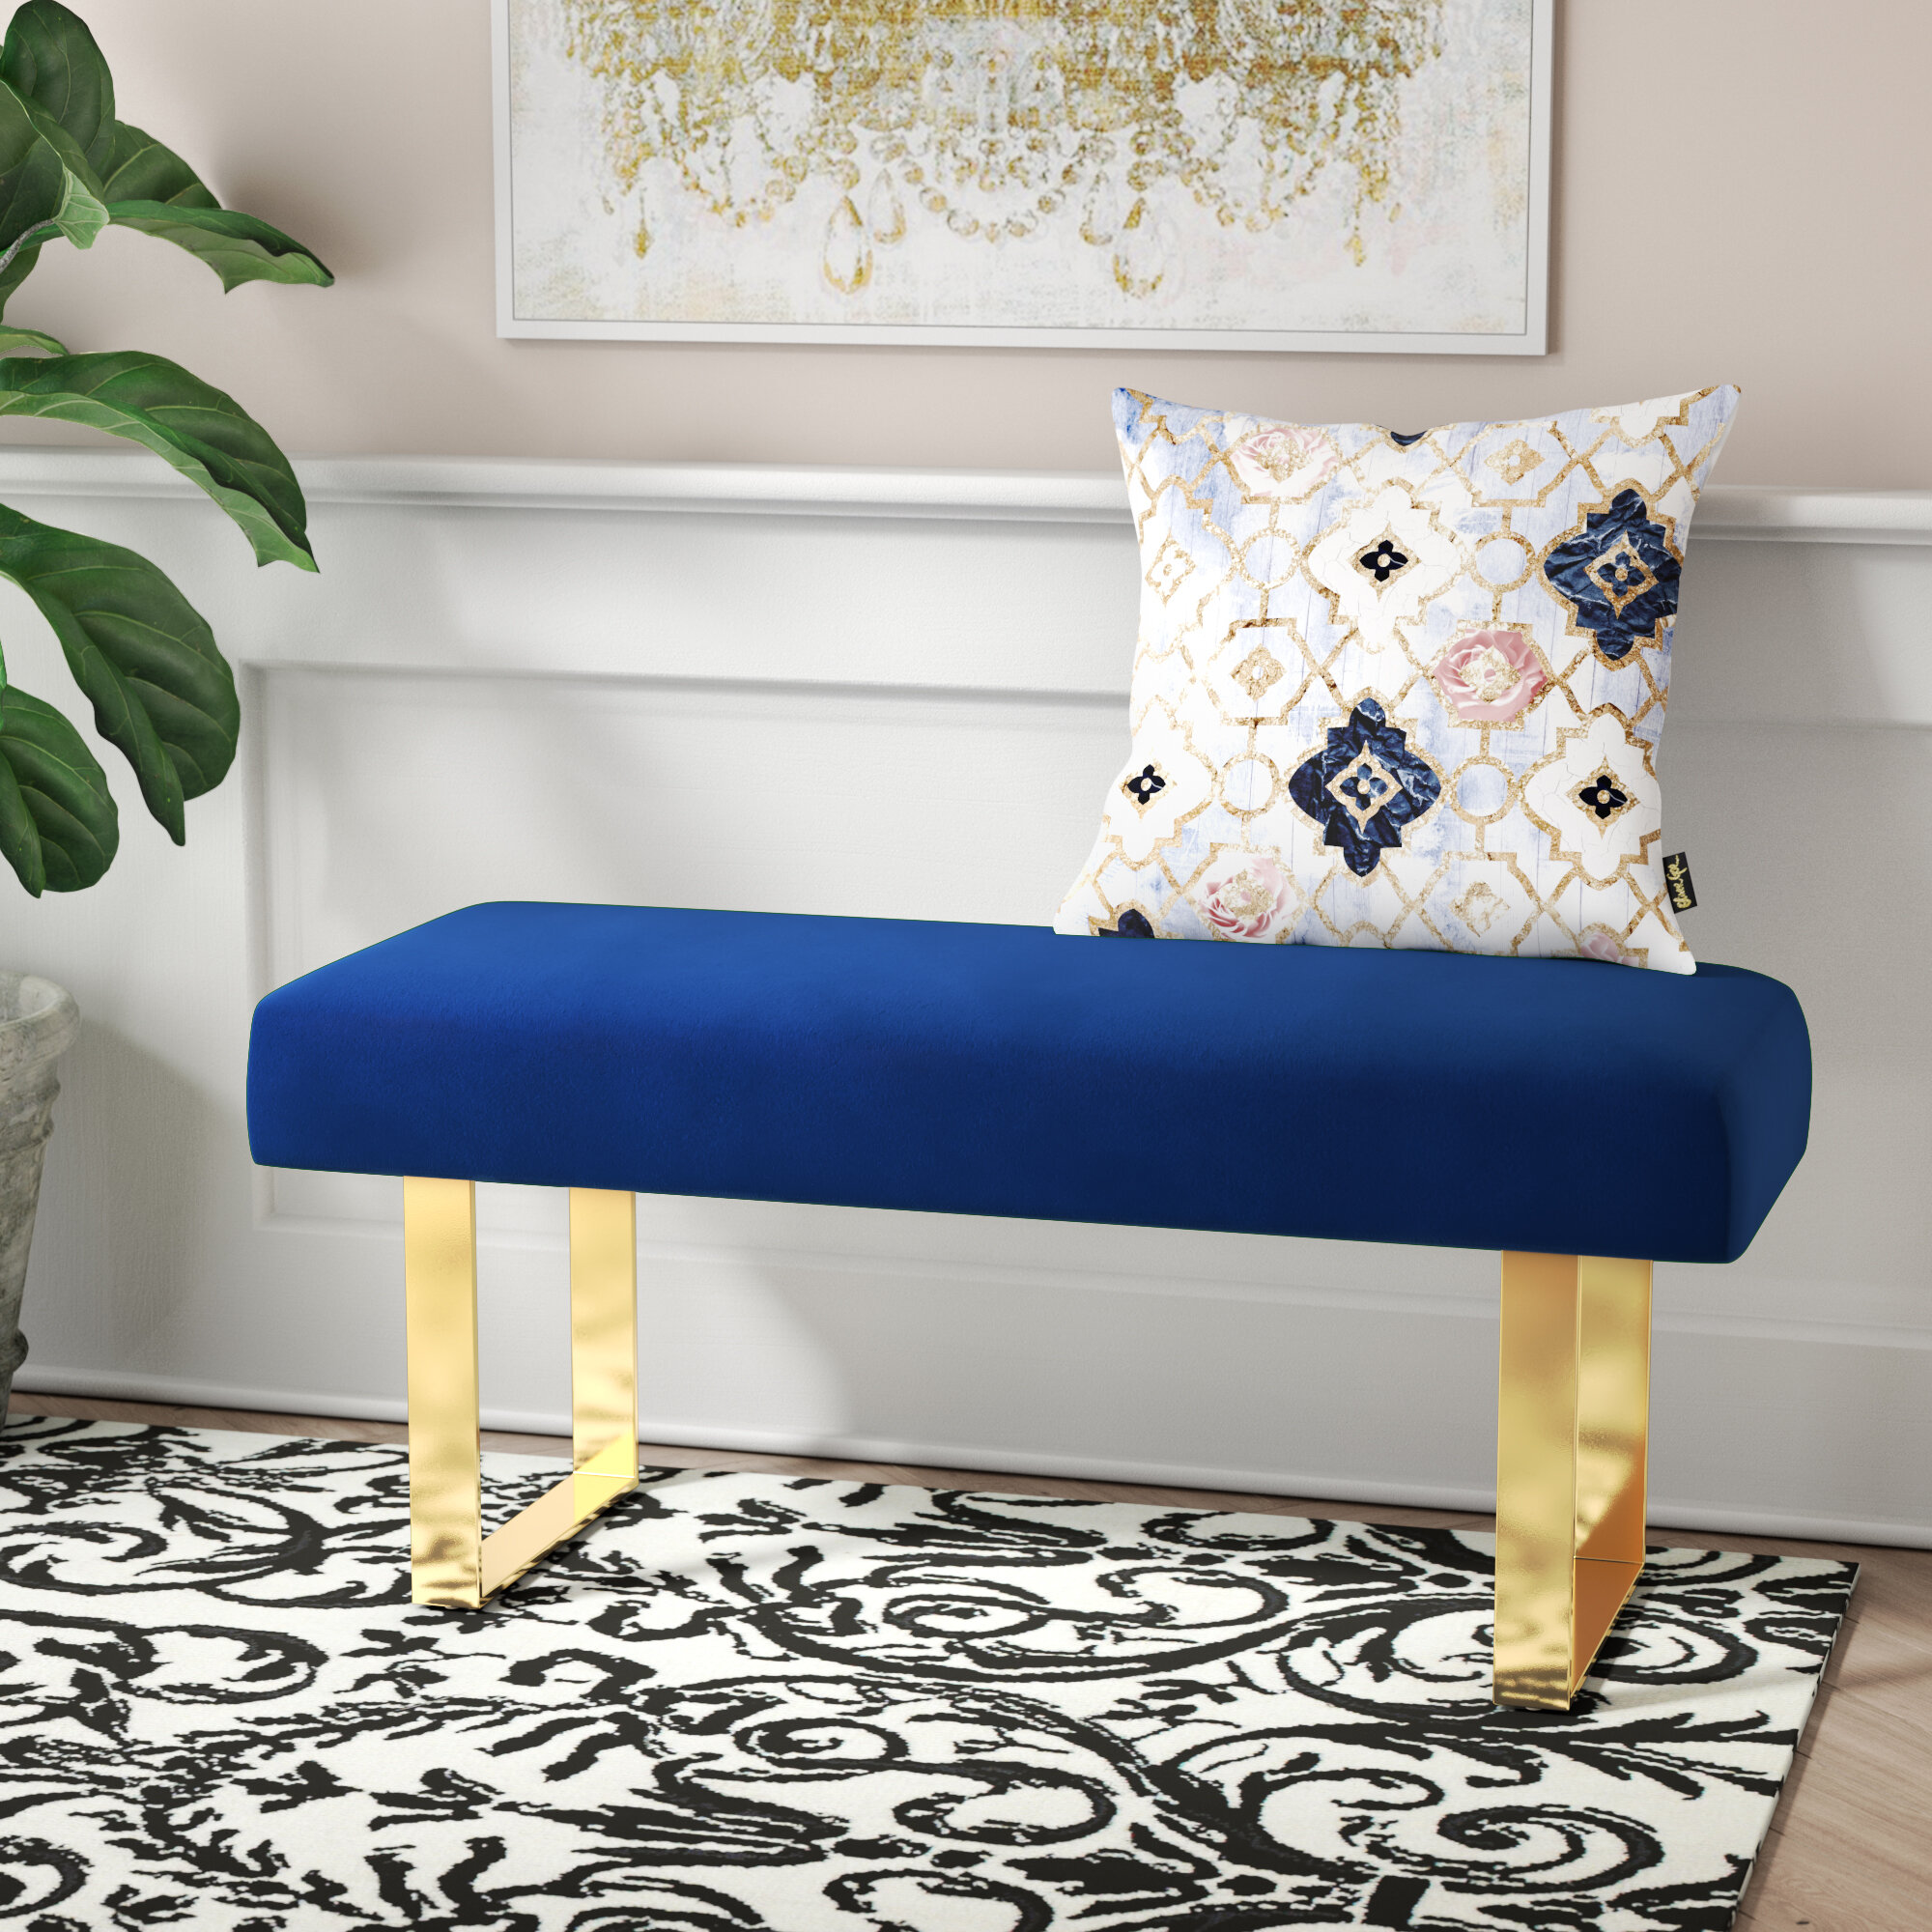 Fantastic Willa Arlo Interiors Kato Bench Reviews Wayfair Pdpeps Interior Chair Design Pdpepsorg